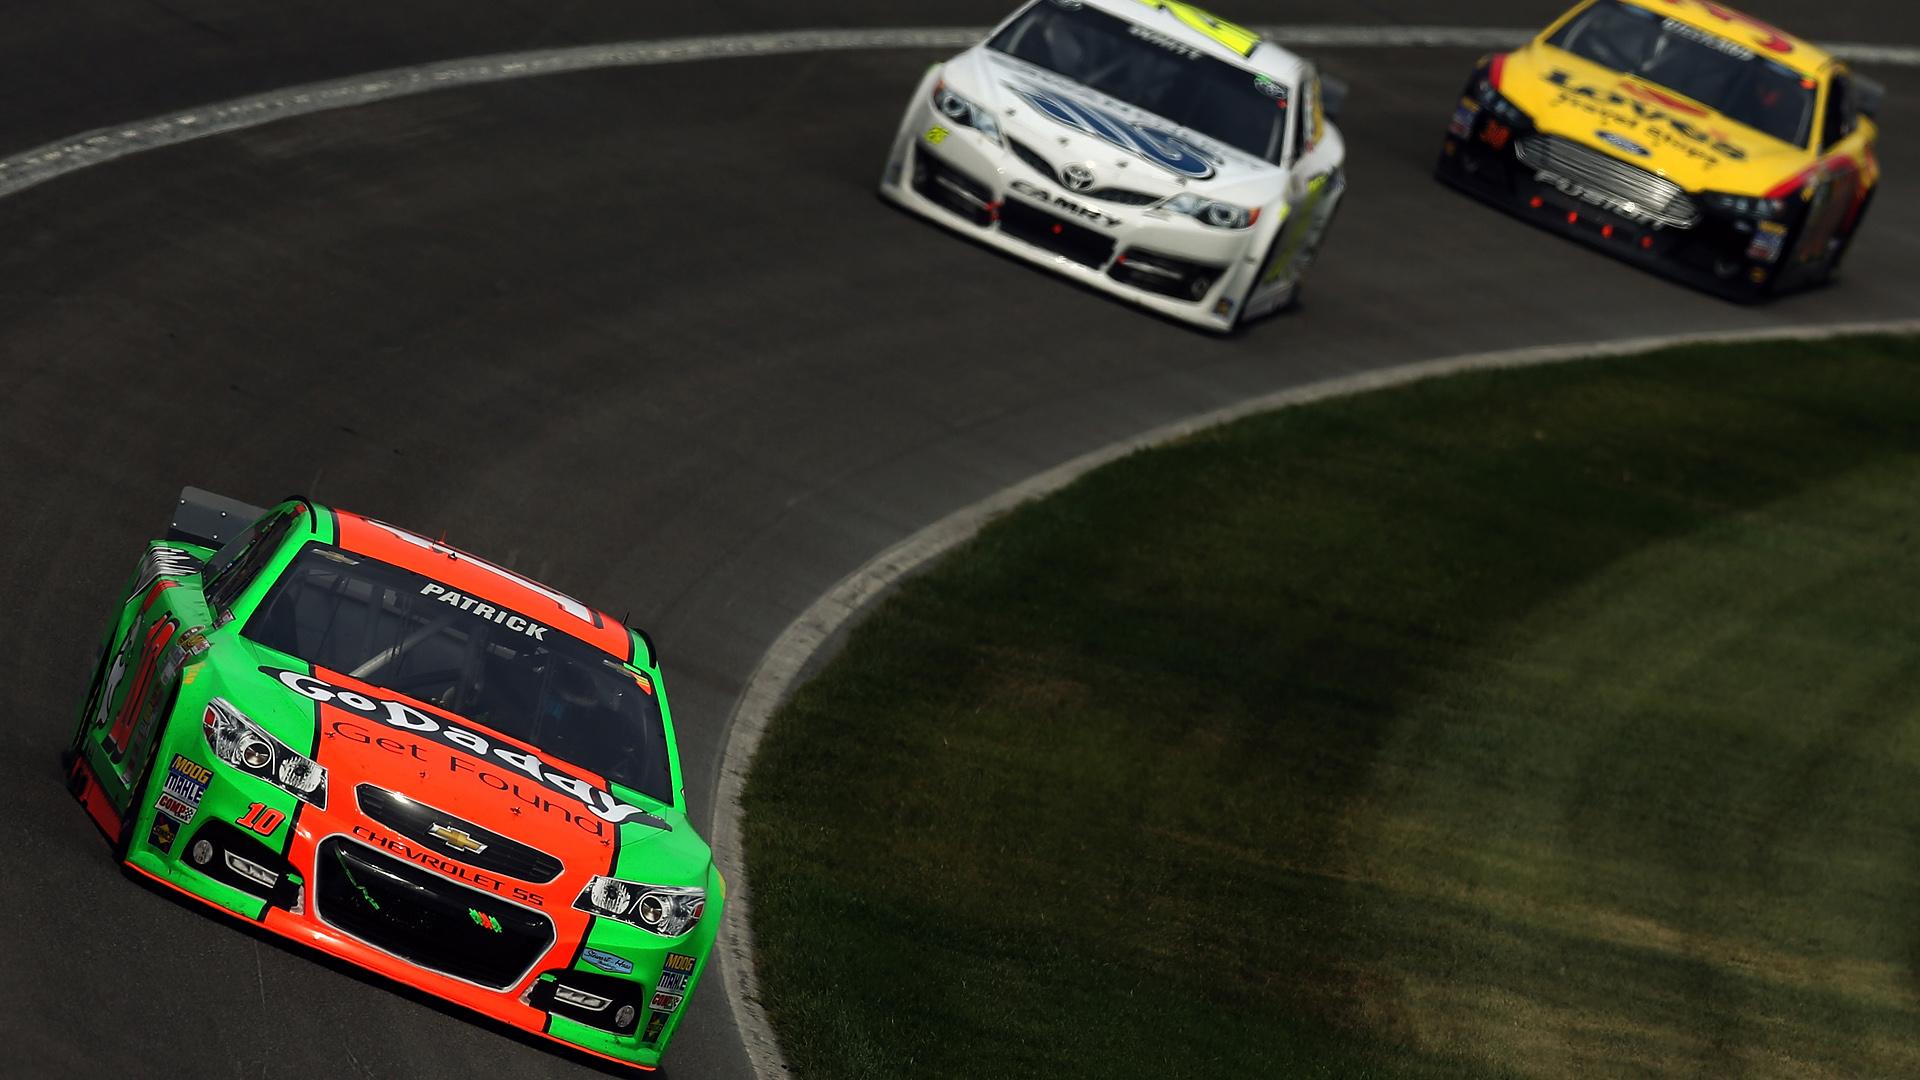 Danica-032414-NASCAR-FTR.jpg